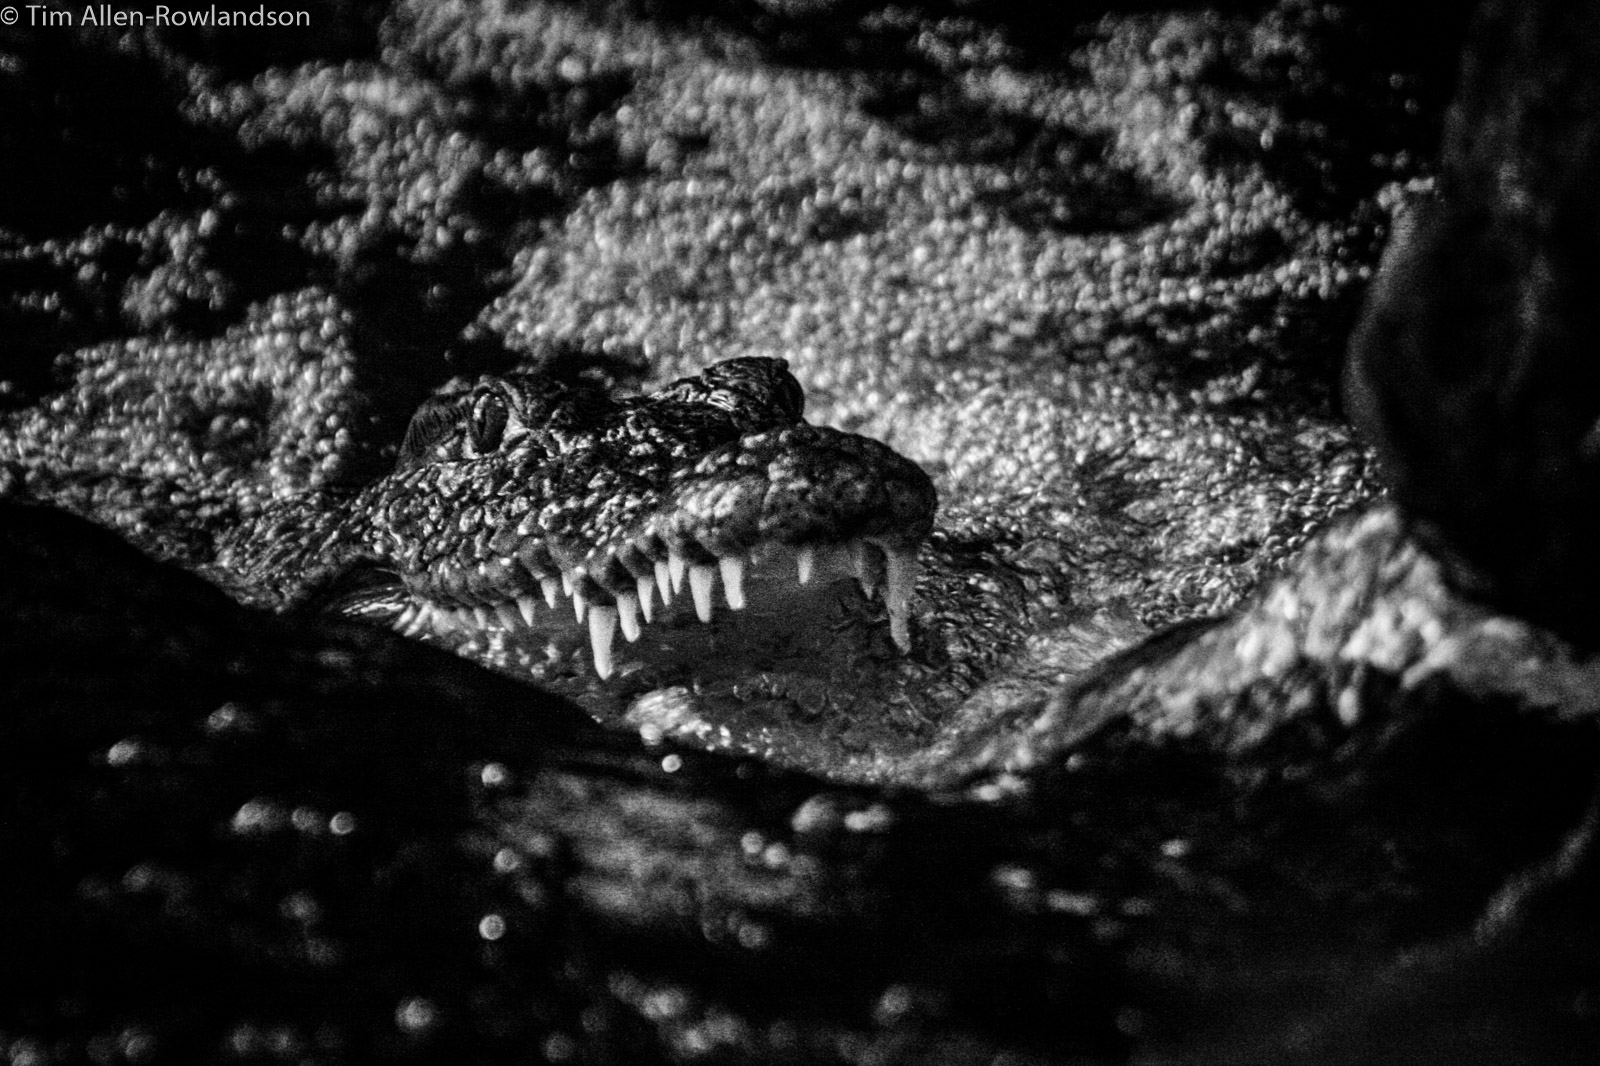 Crocodile fishing in a shallow stream, Tsavo